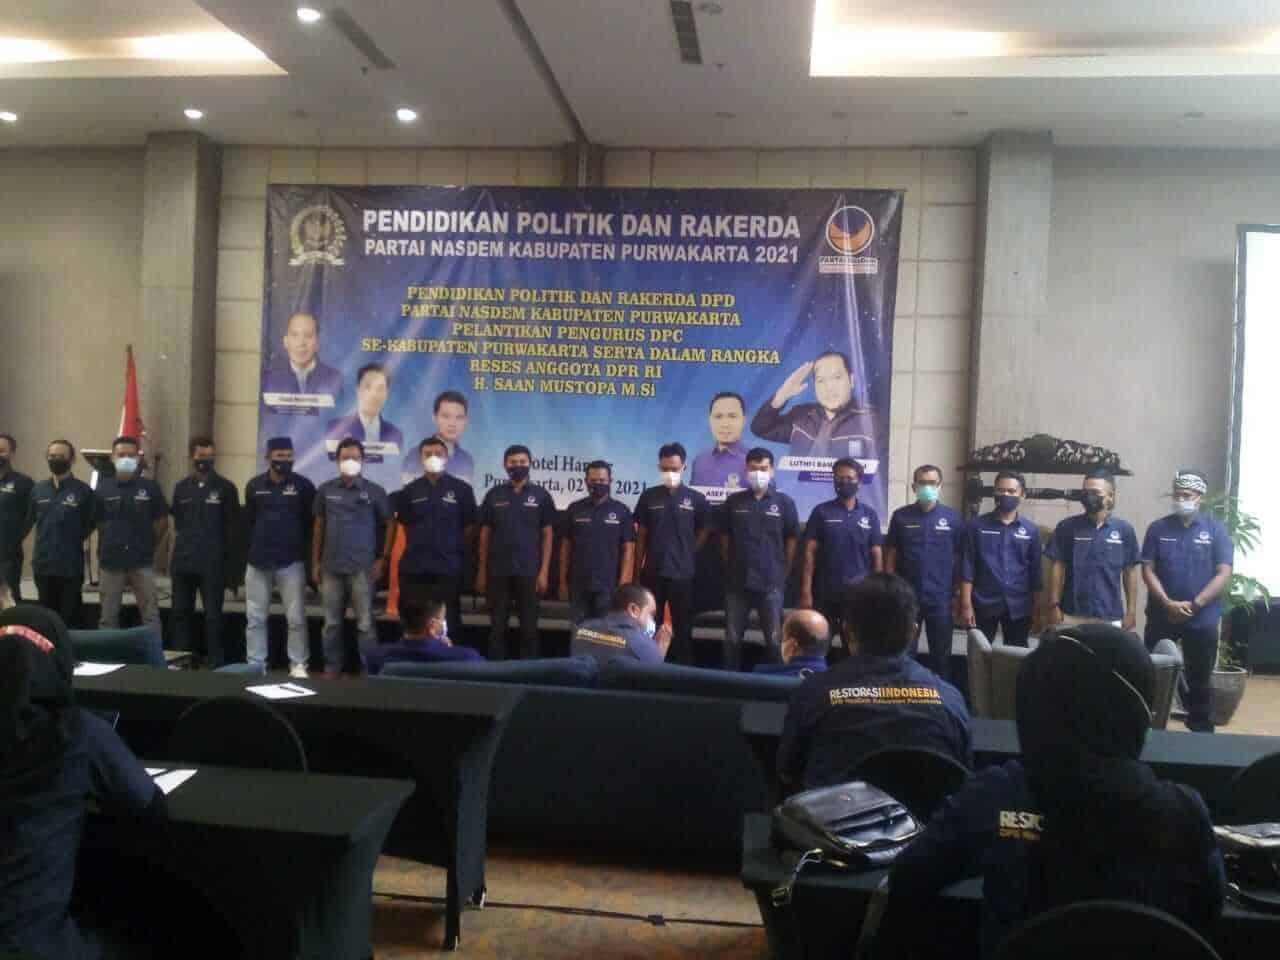 Pengurus DPC (Dewan Pimpinan Cabang ) Partai Nasdem Se-Kabupaten Purwakarta